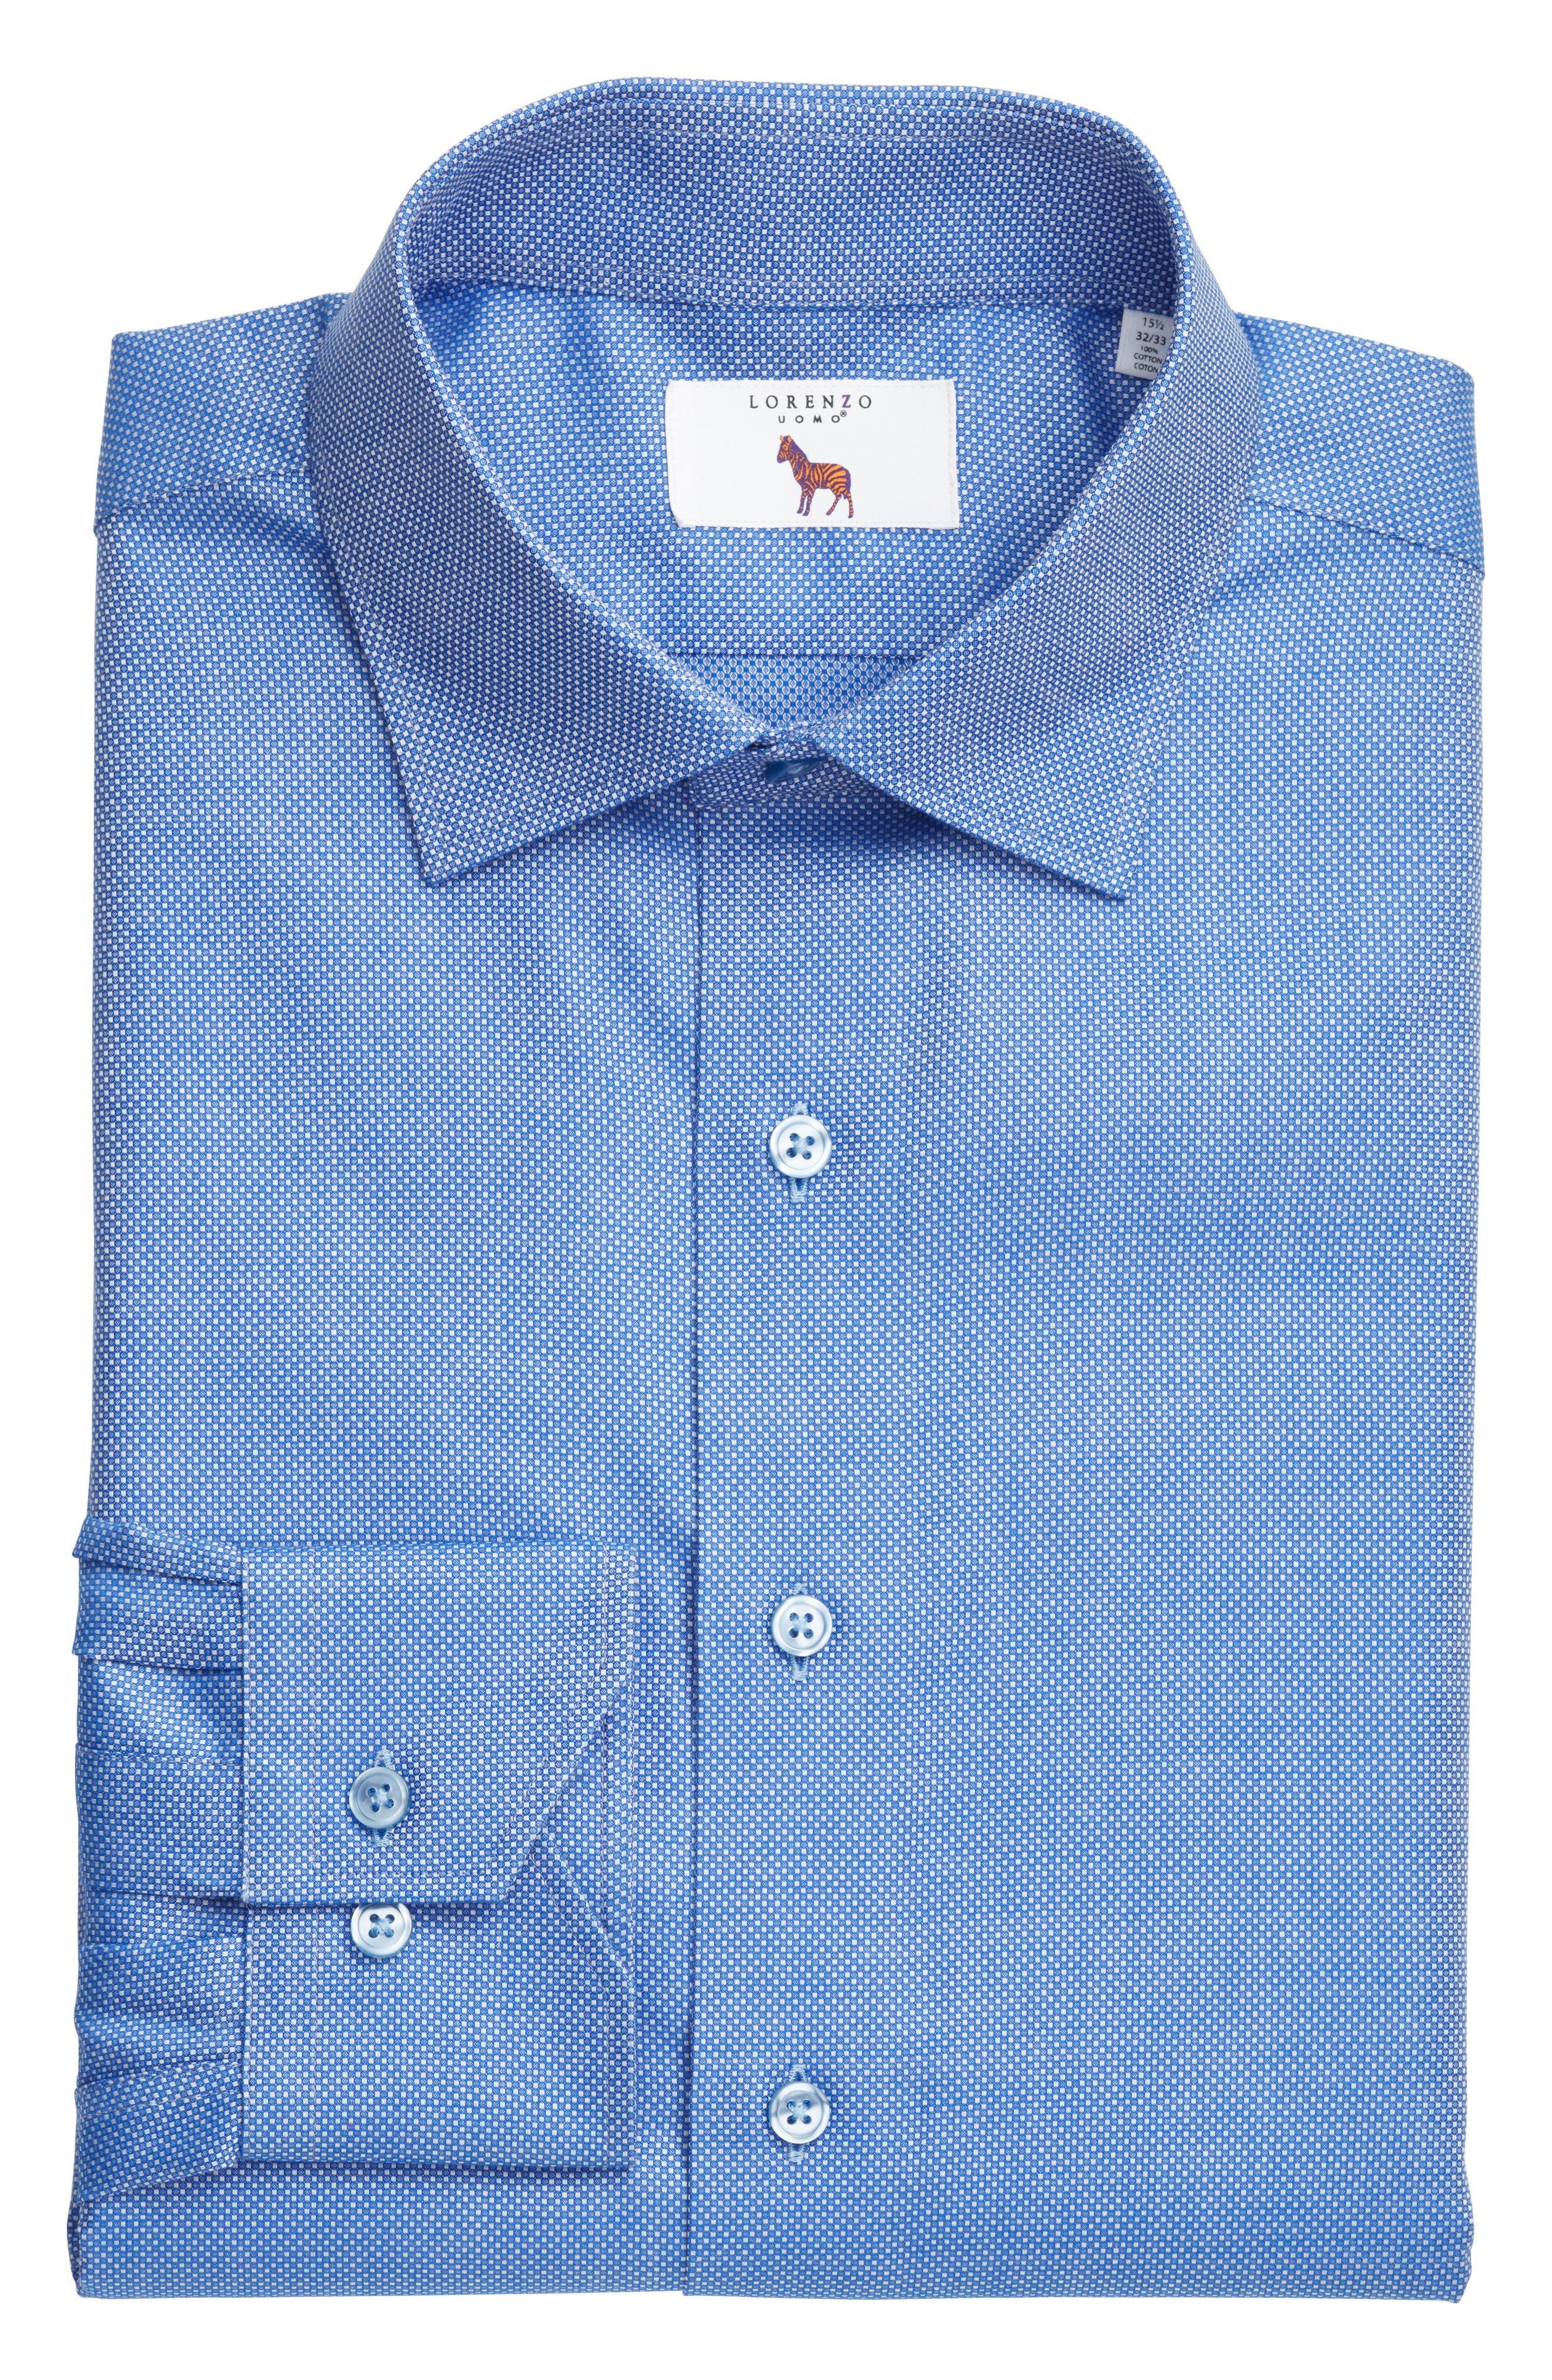 Trim Fit Textured Dress Shirt,                             Alternate thumbnail 3, color,                             NAVY